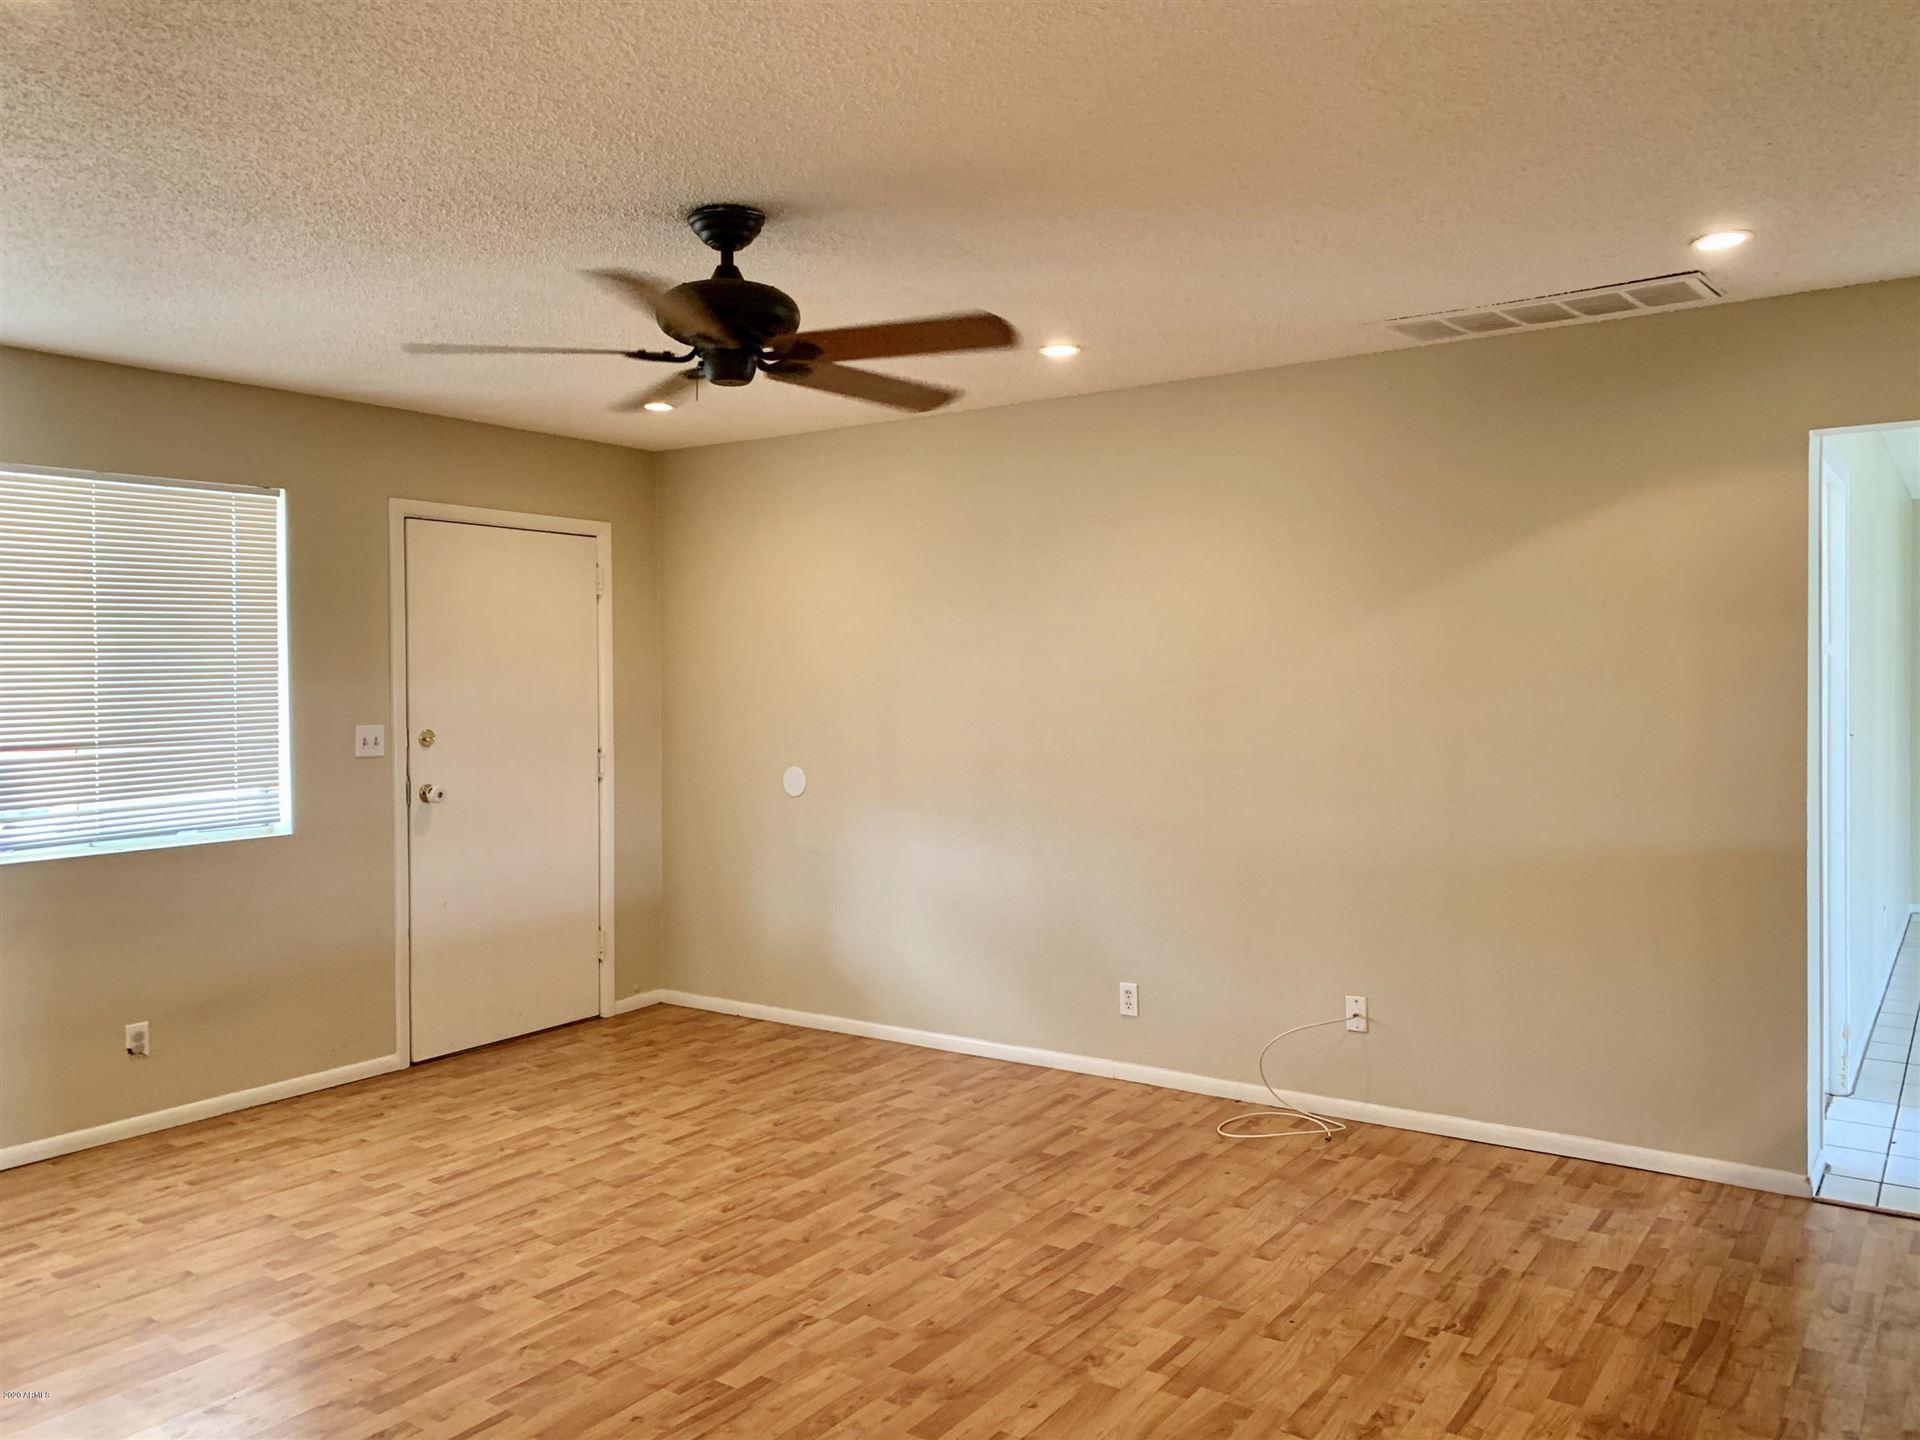 3150 W WILLOW Avenue, Phoenix, AZ 85029 - MLS#: 6243806